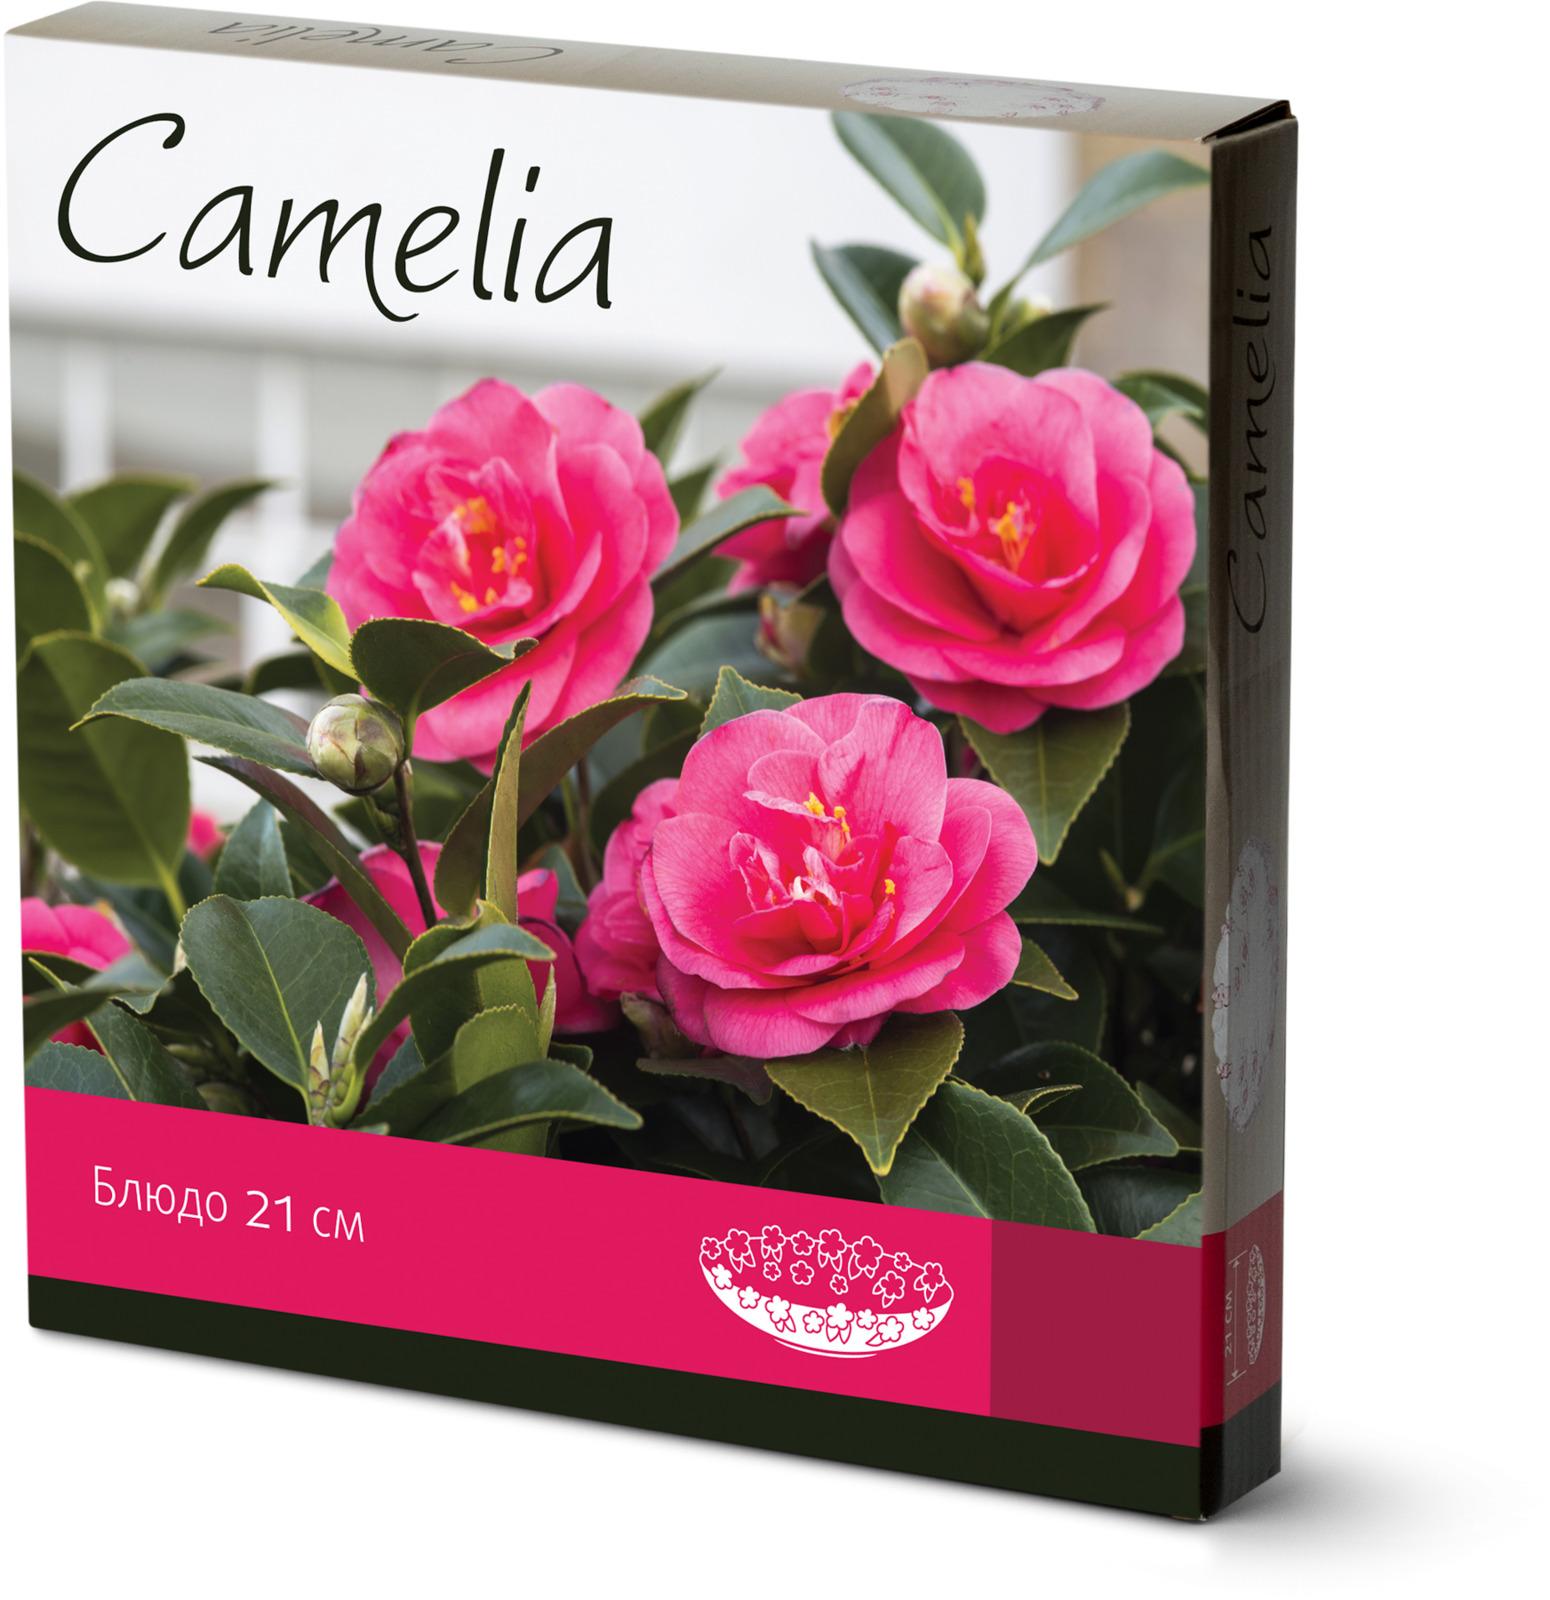 Блюдо Atmosphere Camelia, стеклянное, диаметр 21,5 см